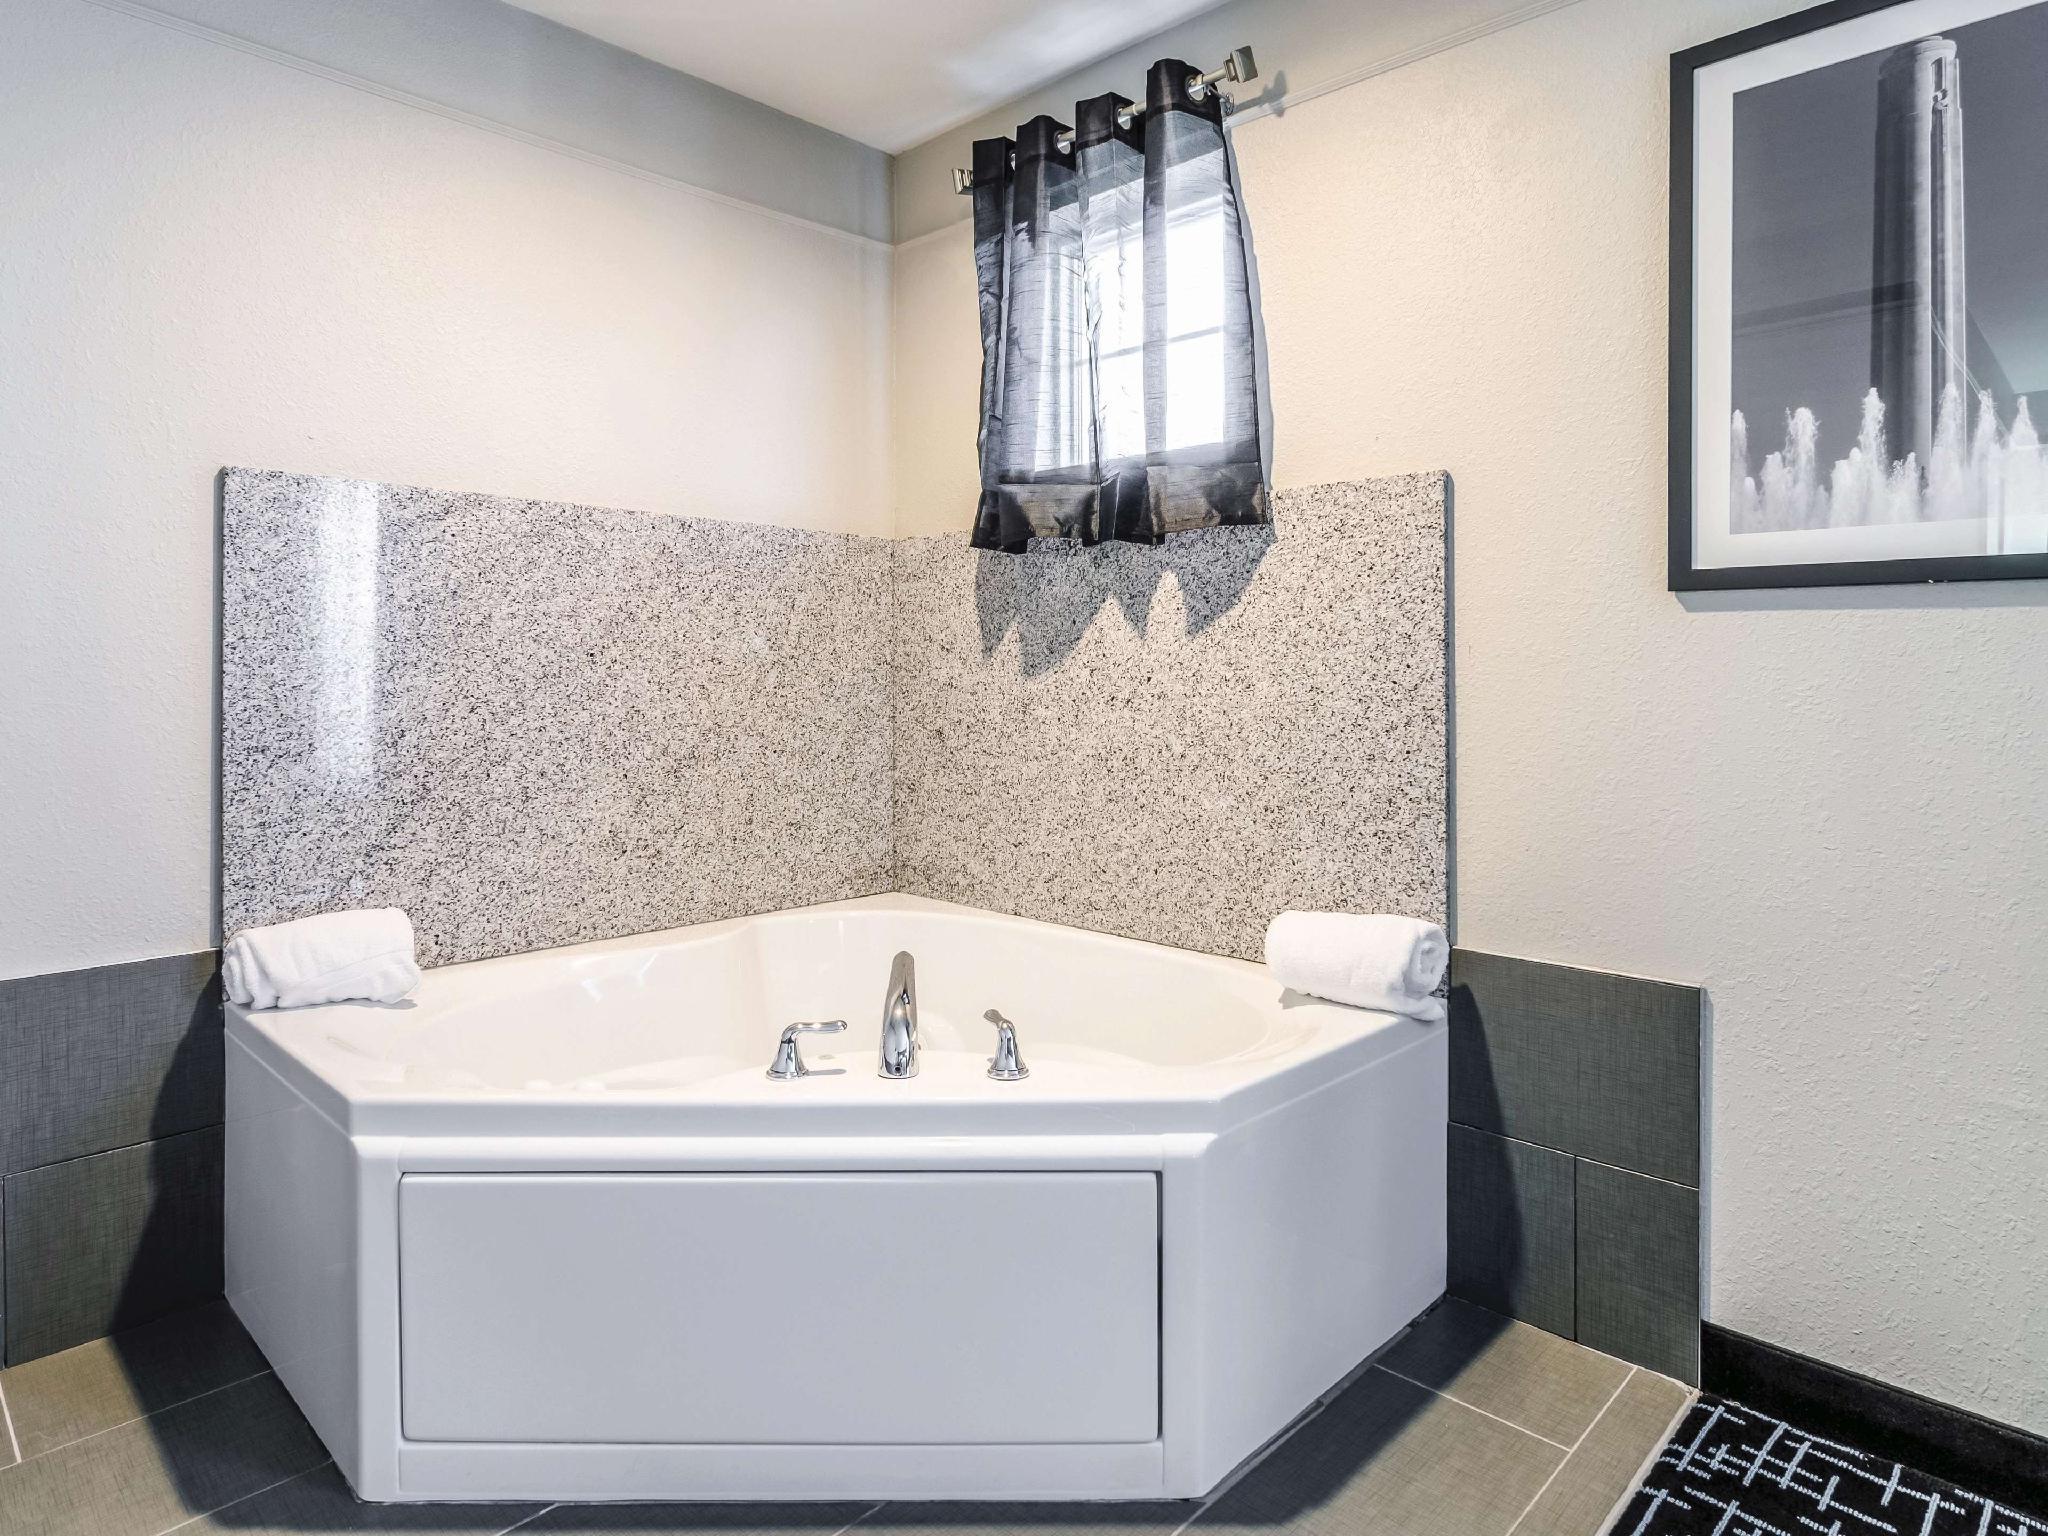 La Quinta Inn Suites By Wyndham Kansas City Airport Hotel Kansas City Mo Deals Photos Reviews